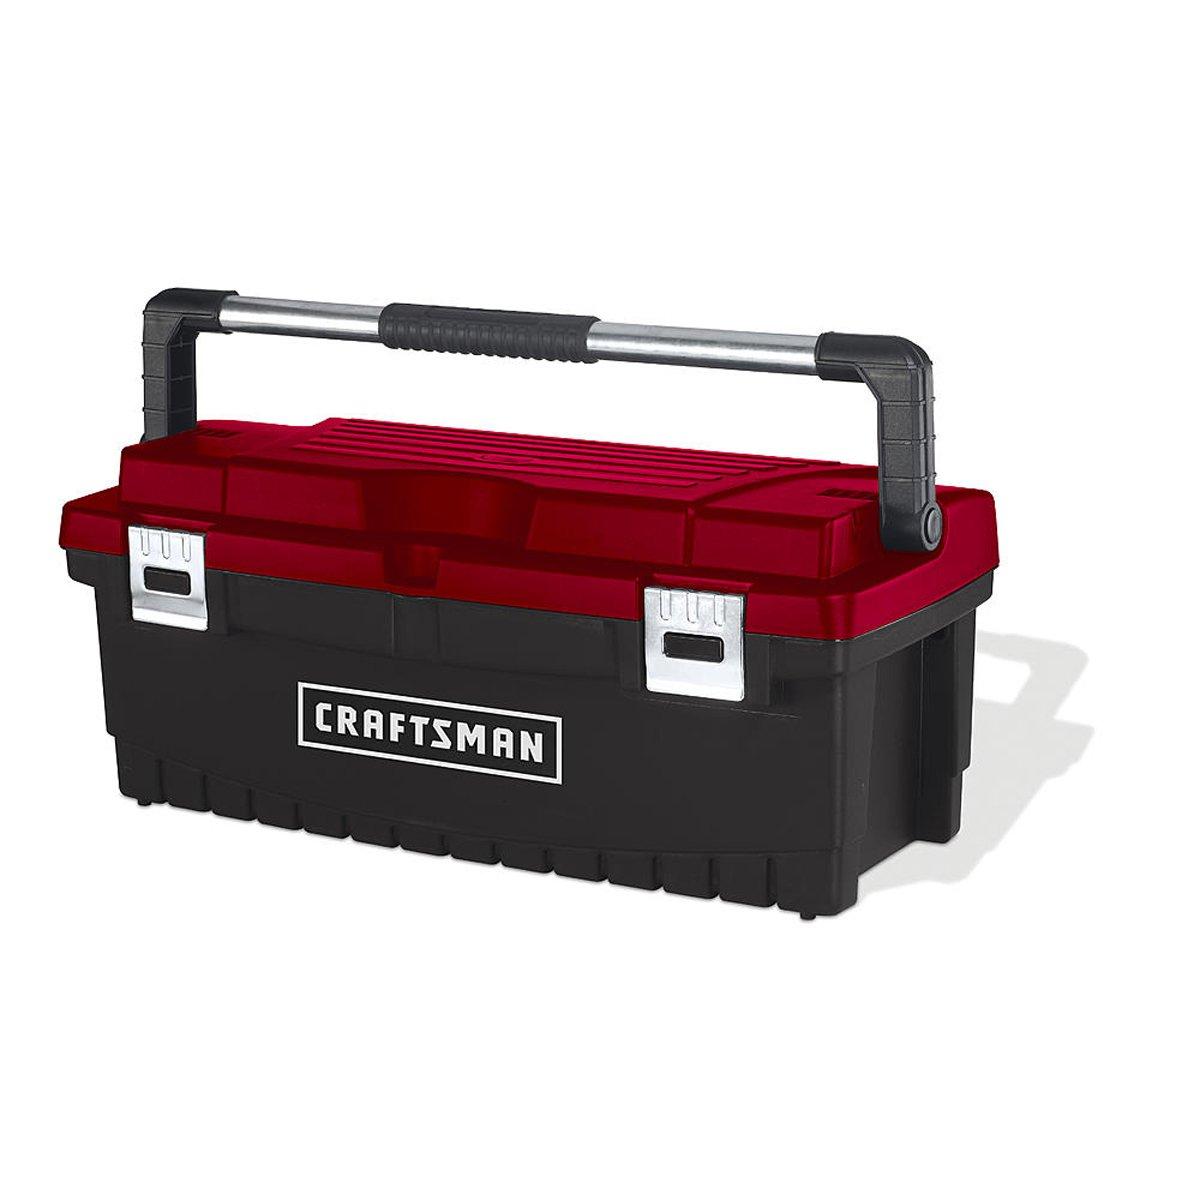 Caja de resina para herramientas 26 sears com mx me - Caja de herramientas precio ...